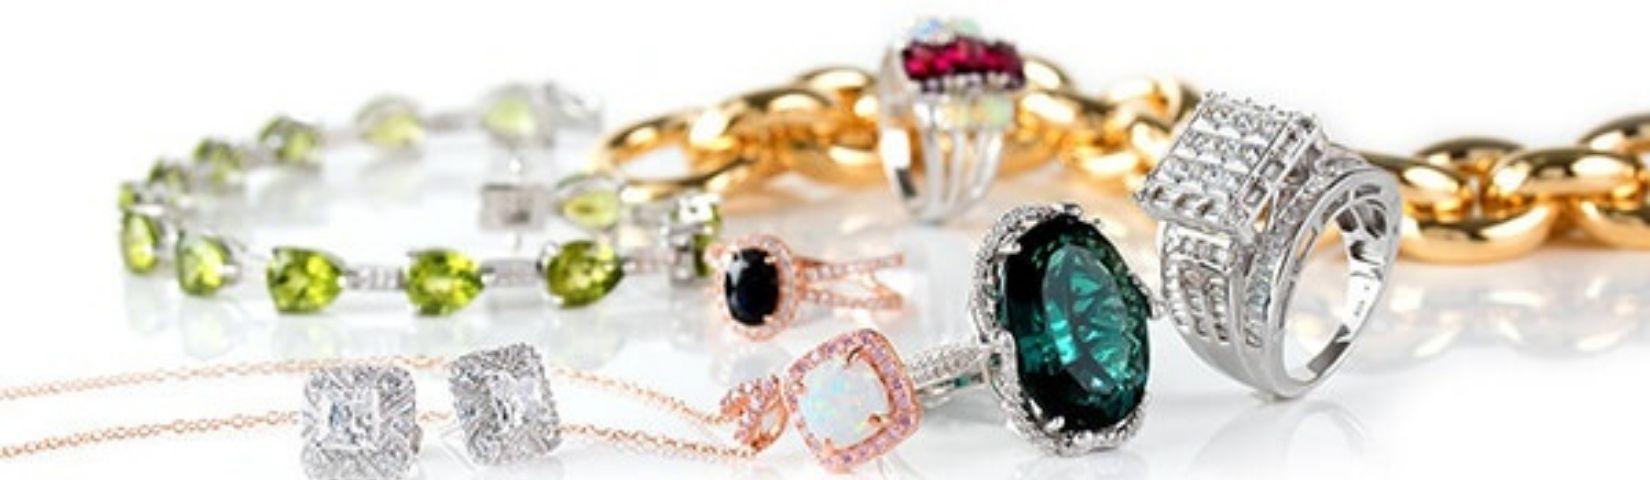 Luxury Jewelry Supplier